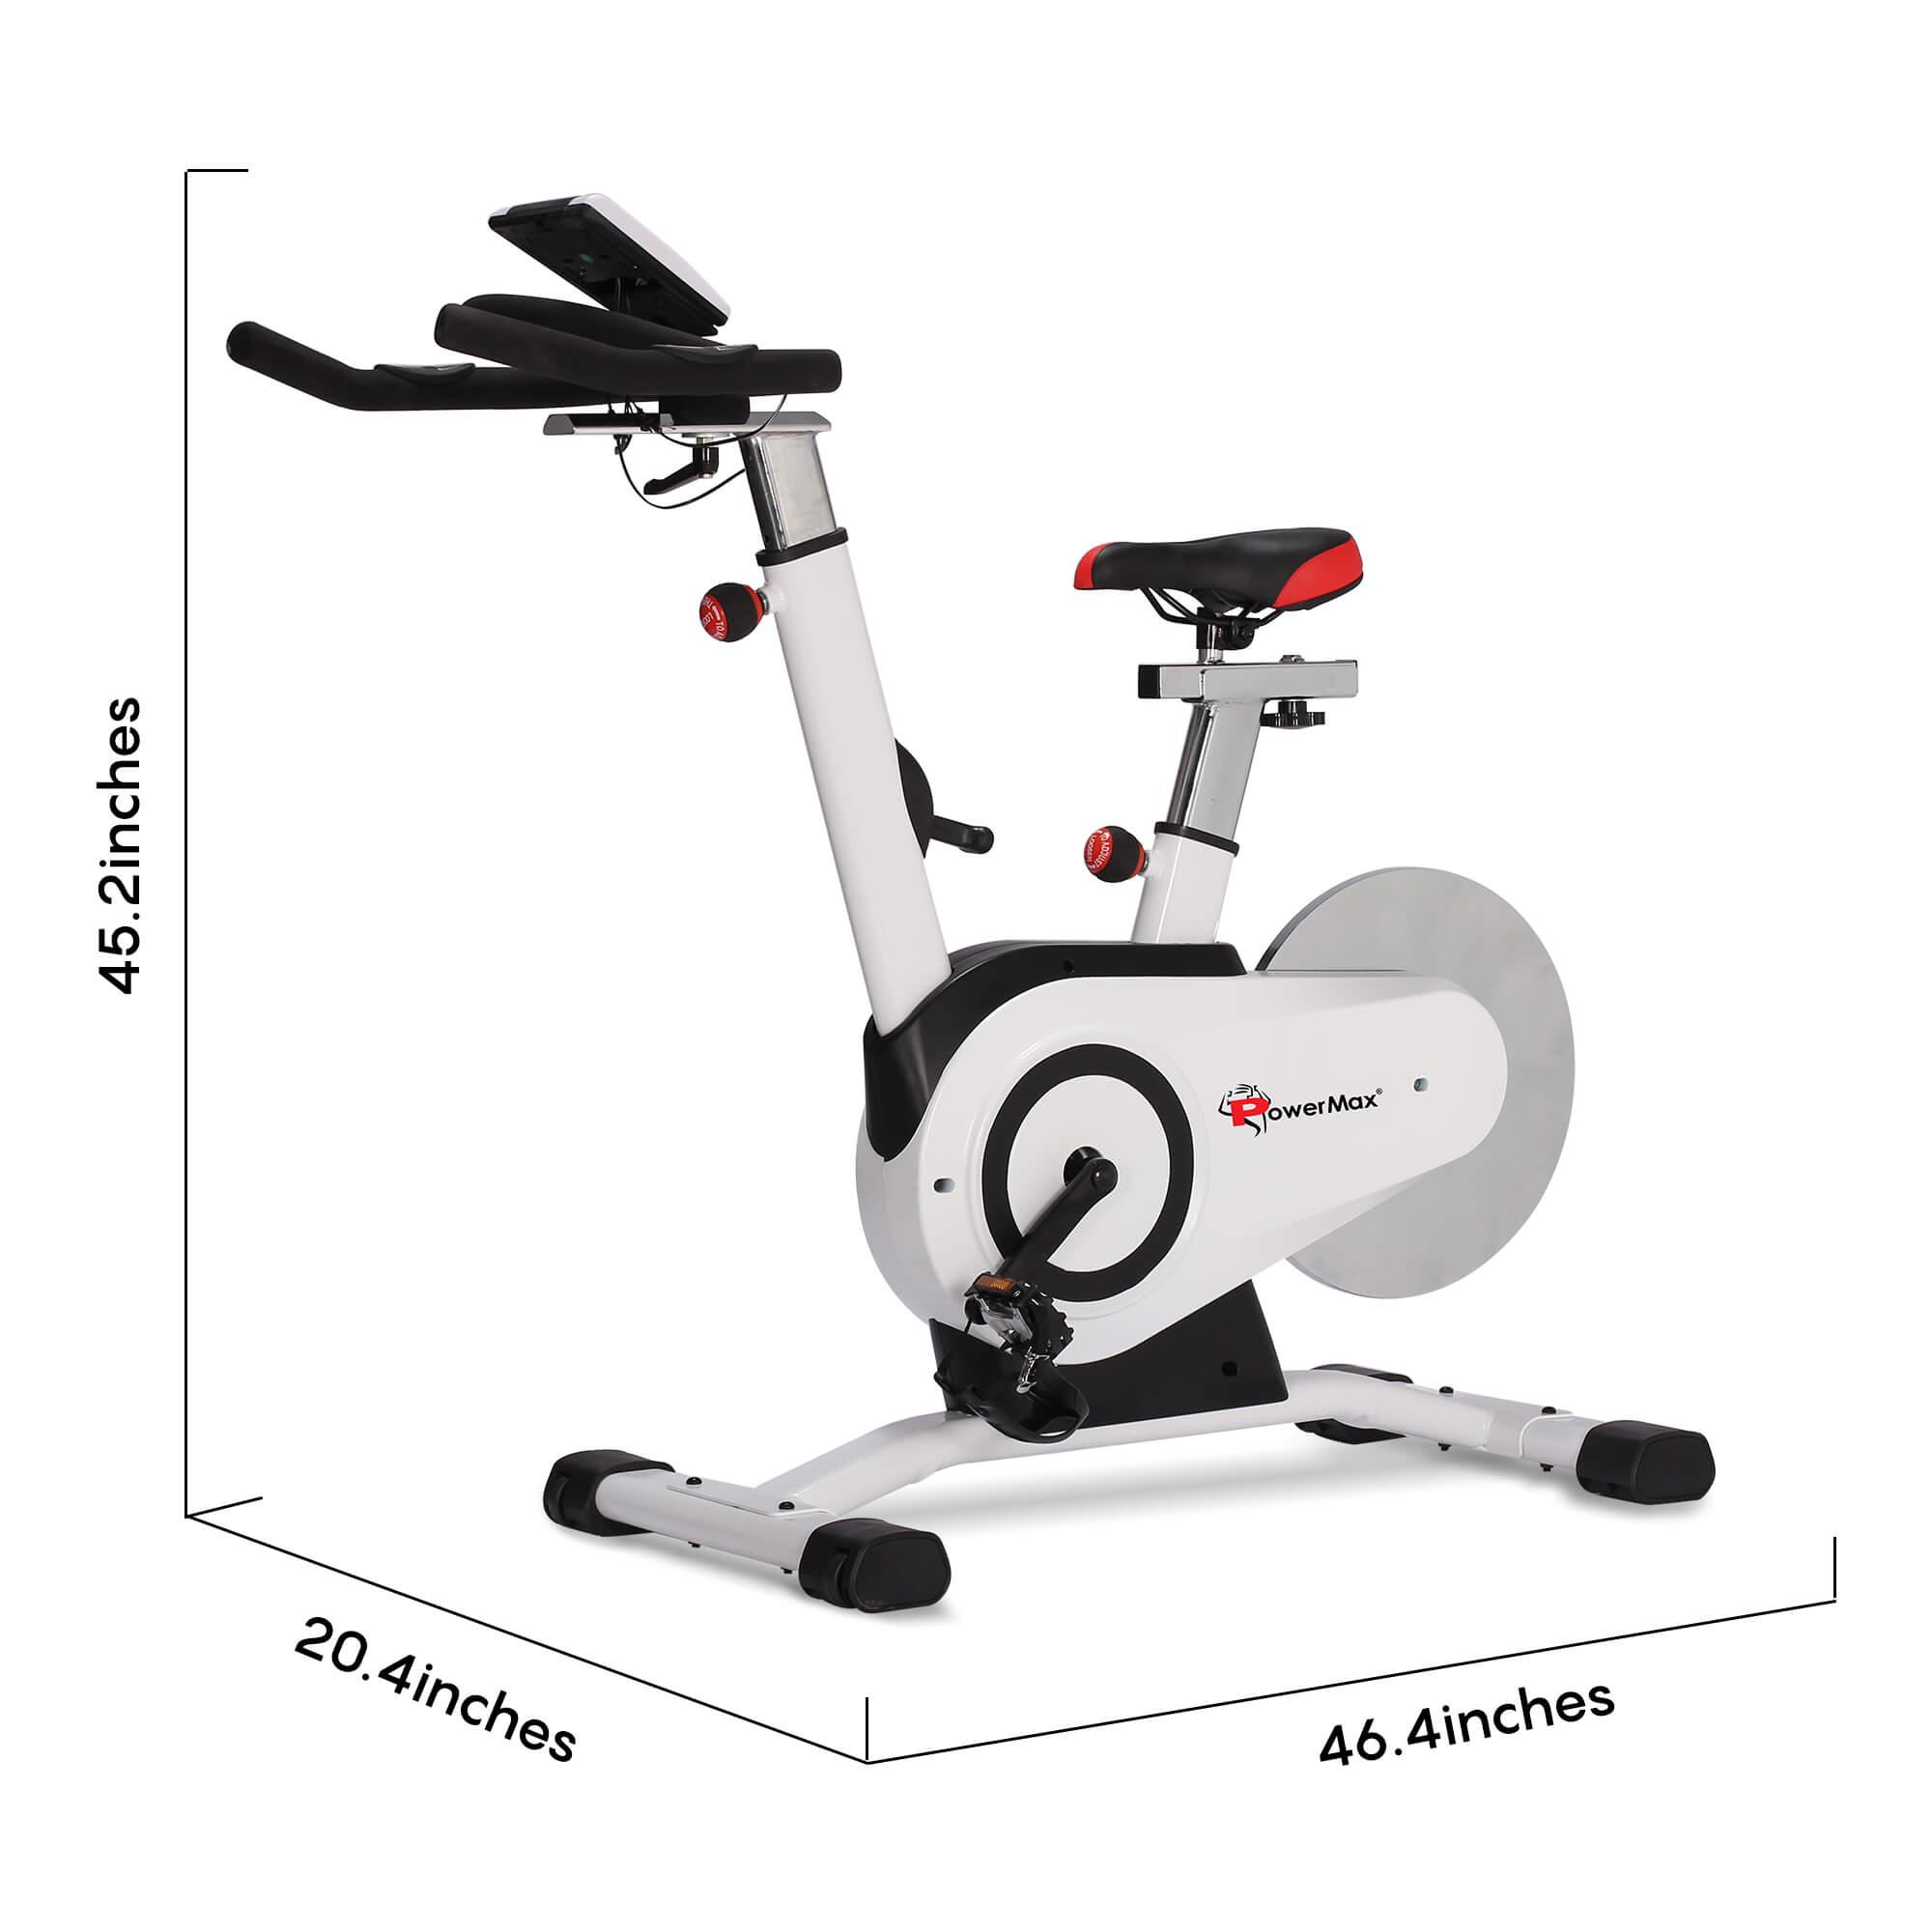 BS 160 Home Use Group Bike by Powermax Fitness